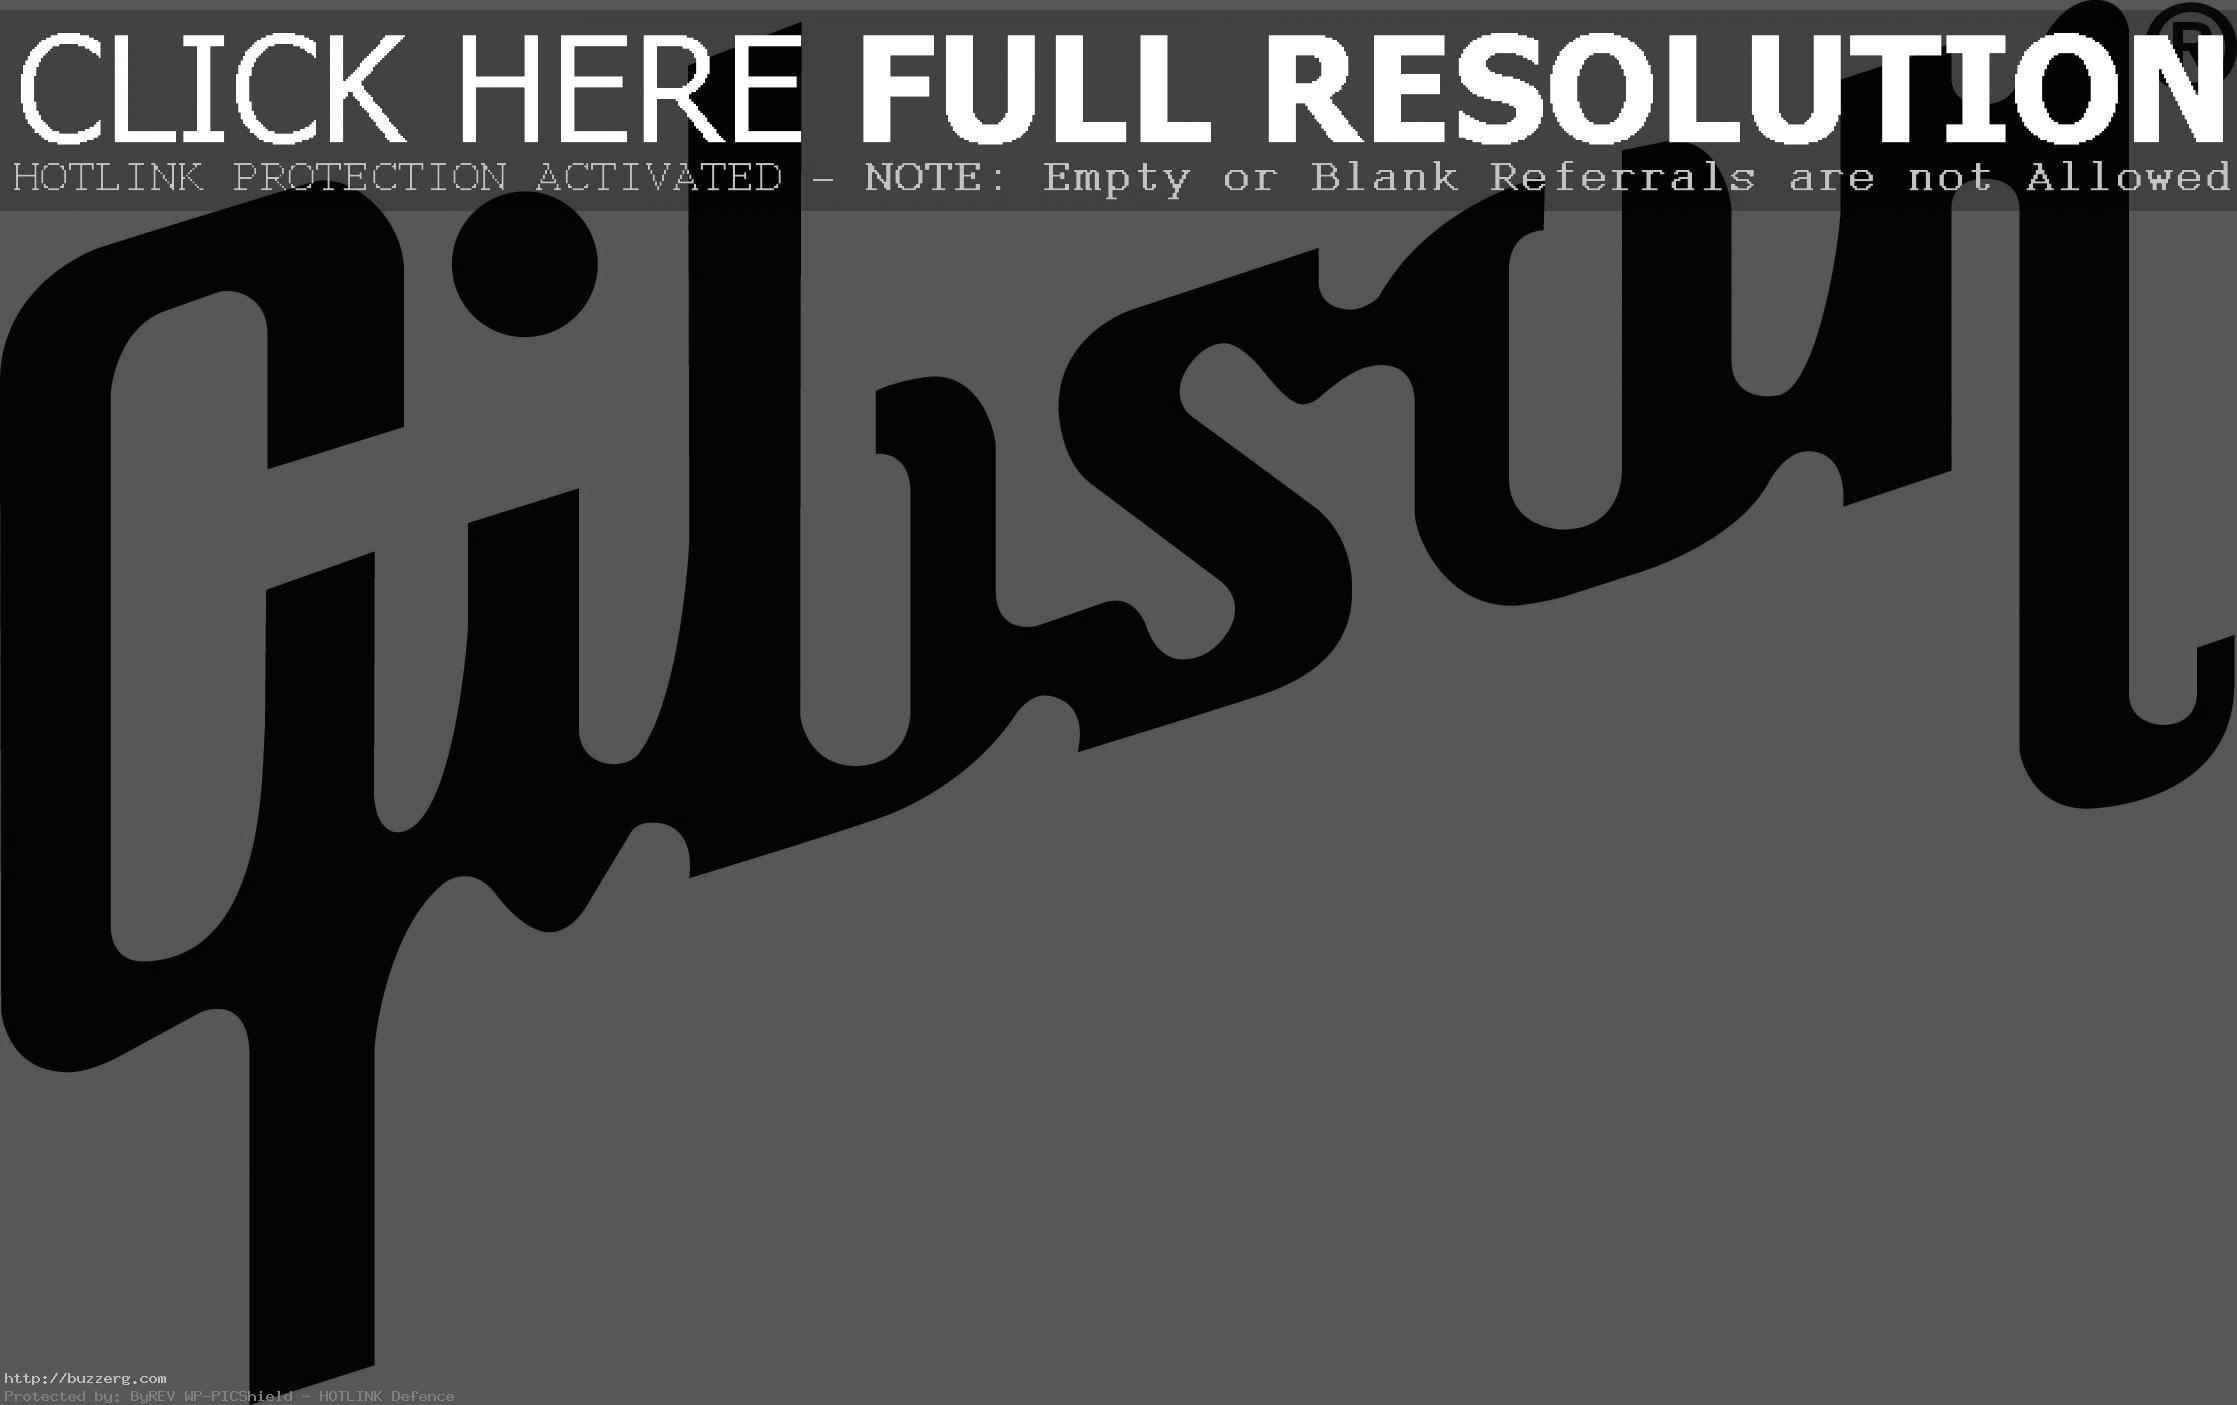 Gibson Guitar (id: 42624)